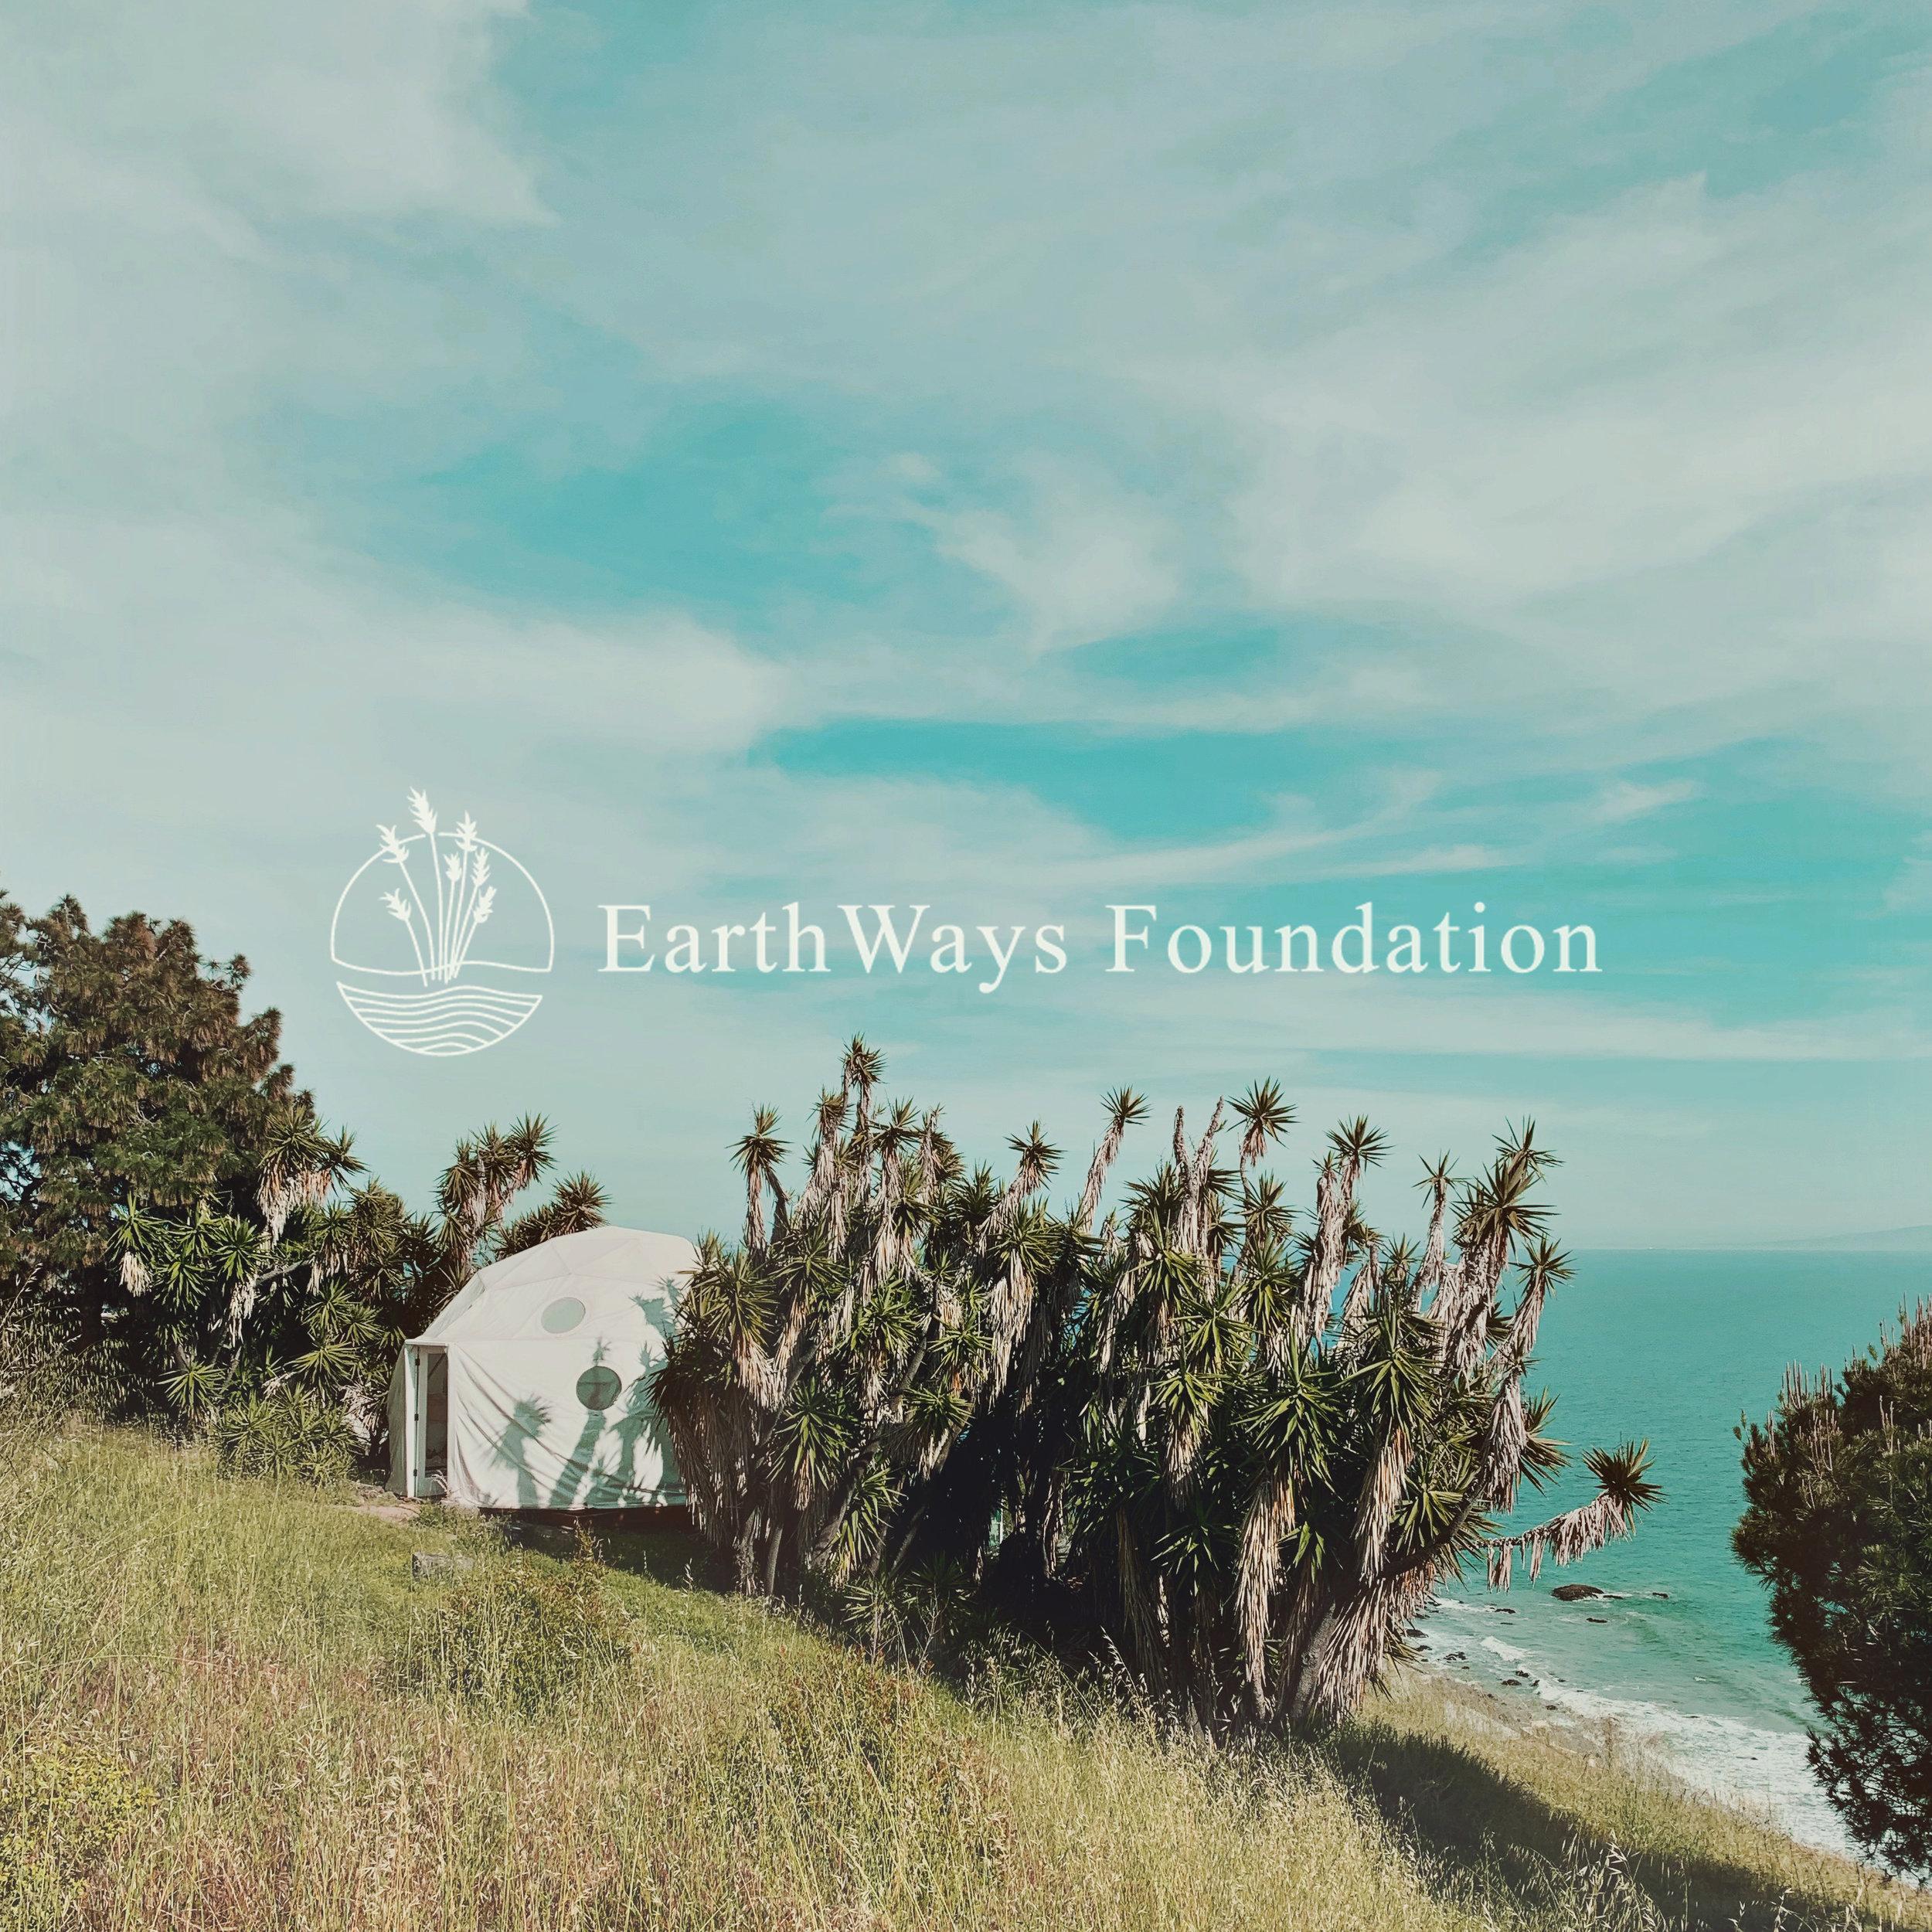 five+sense+collective+earthways+foundation+andrew+beath+malibu+healing+haven.jpg